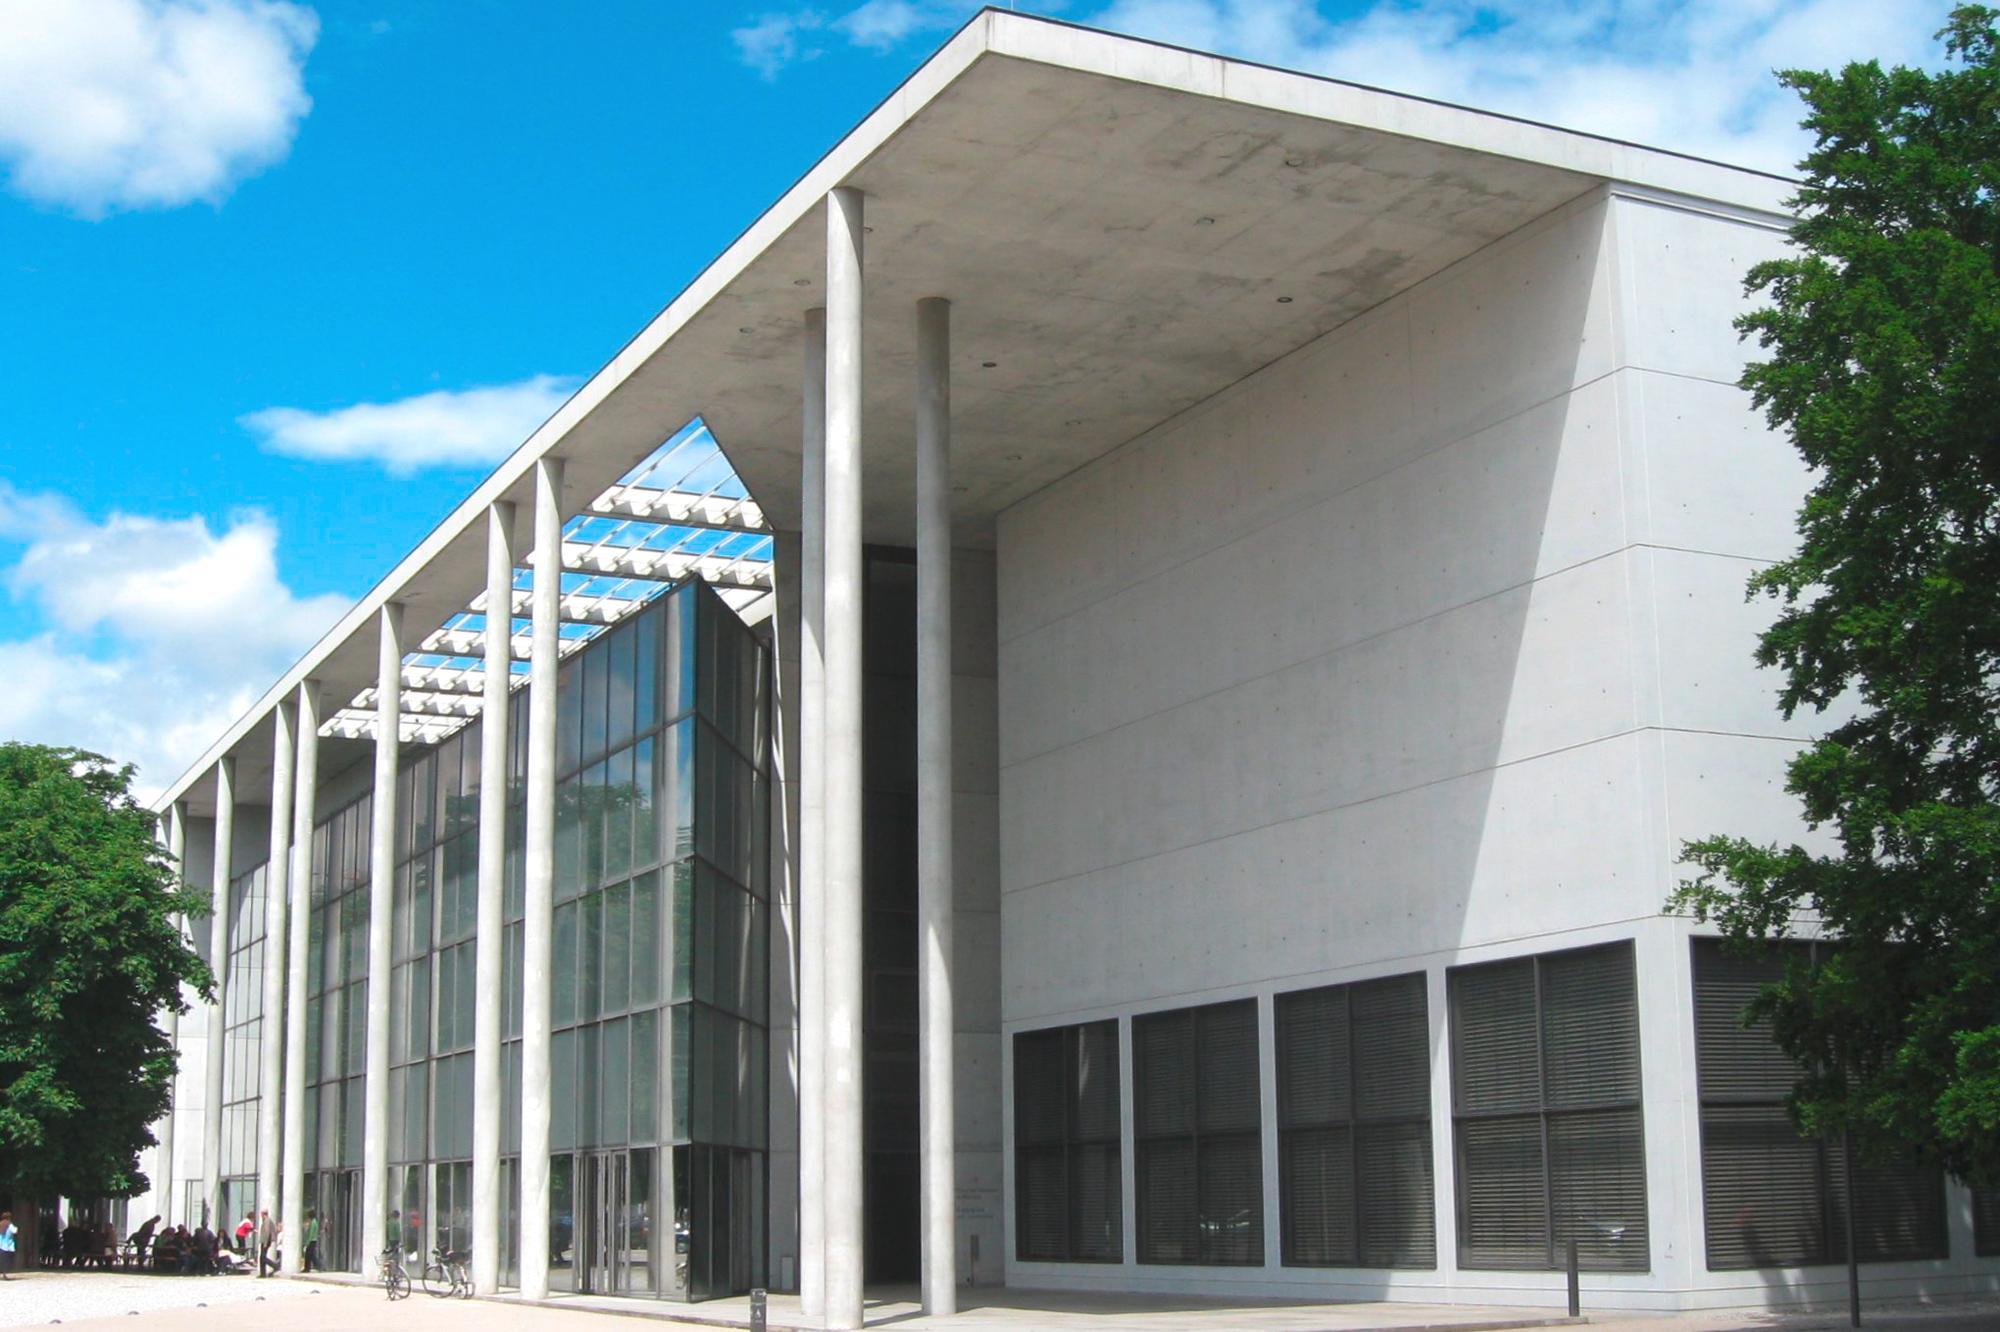 architekturmuseum museum of architecure pinakothek der